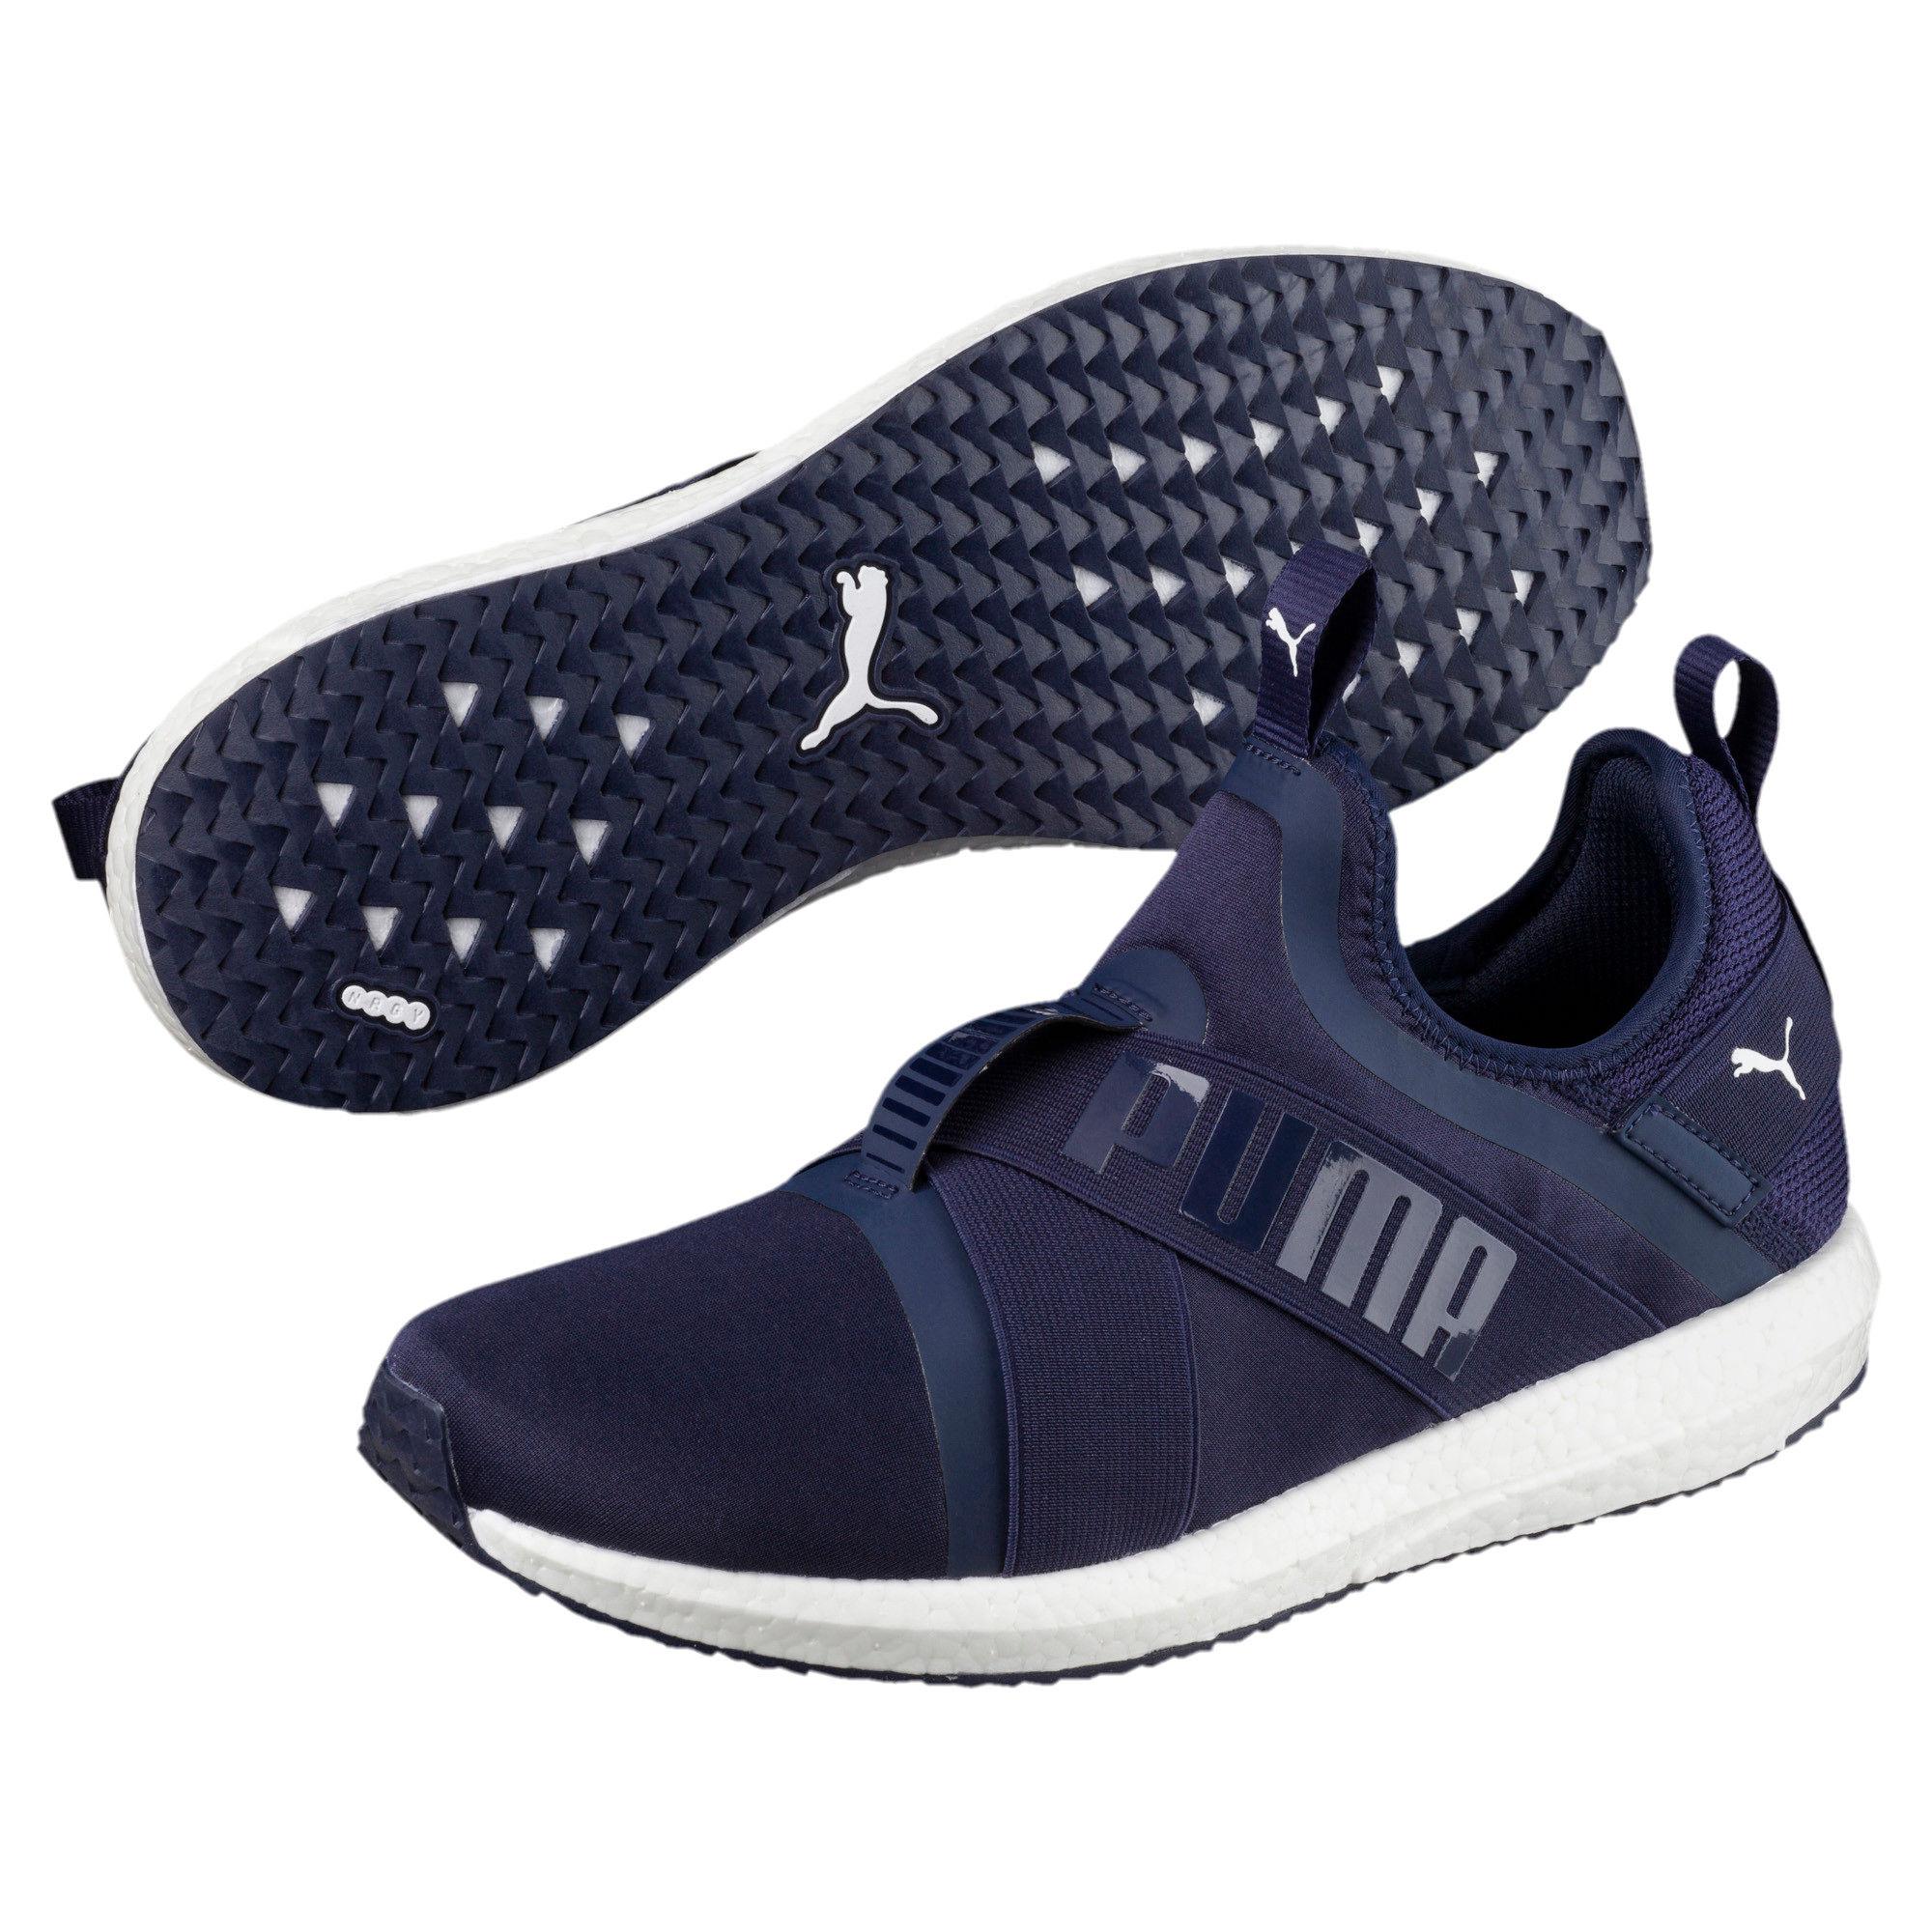 Puma Mega Nrgy X Running Shoe: Buy Puma